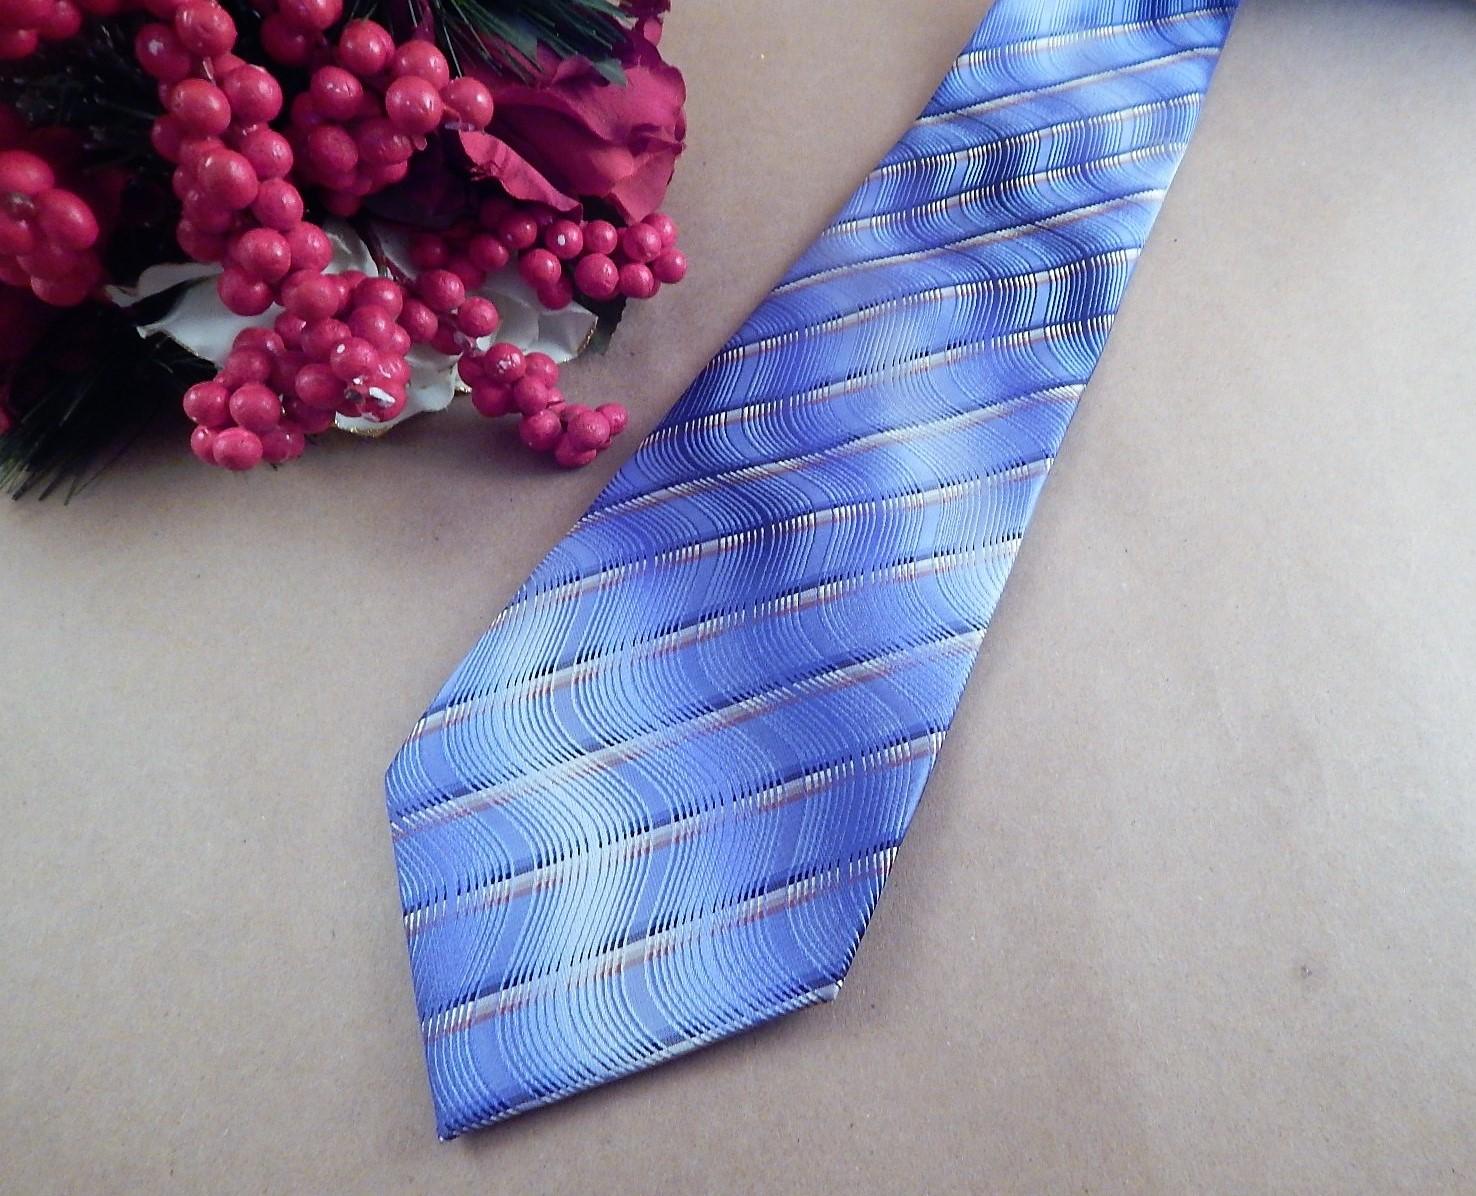 Mens Necktie Van Heusen Silk Tie Light Blue and Gold Striped Neckwear Vintage Mens Business Suit Formal Accessory